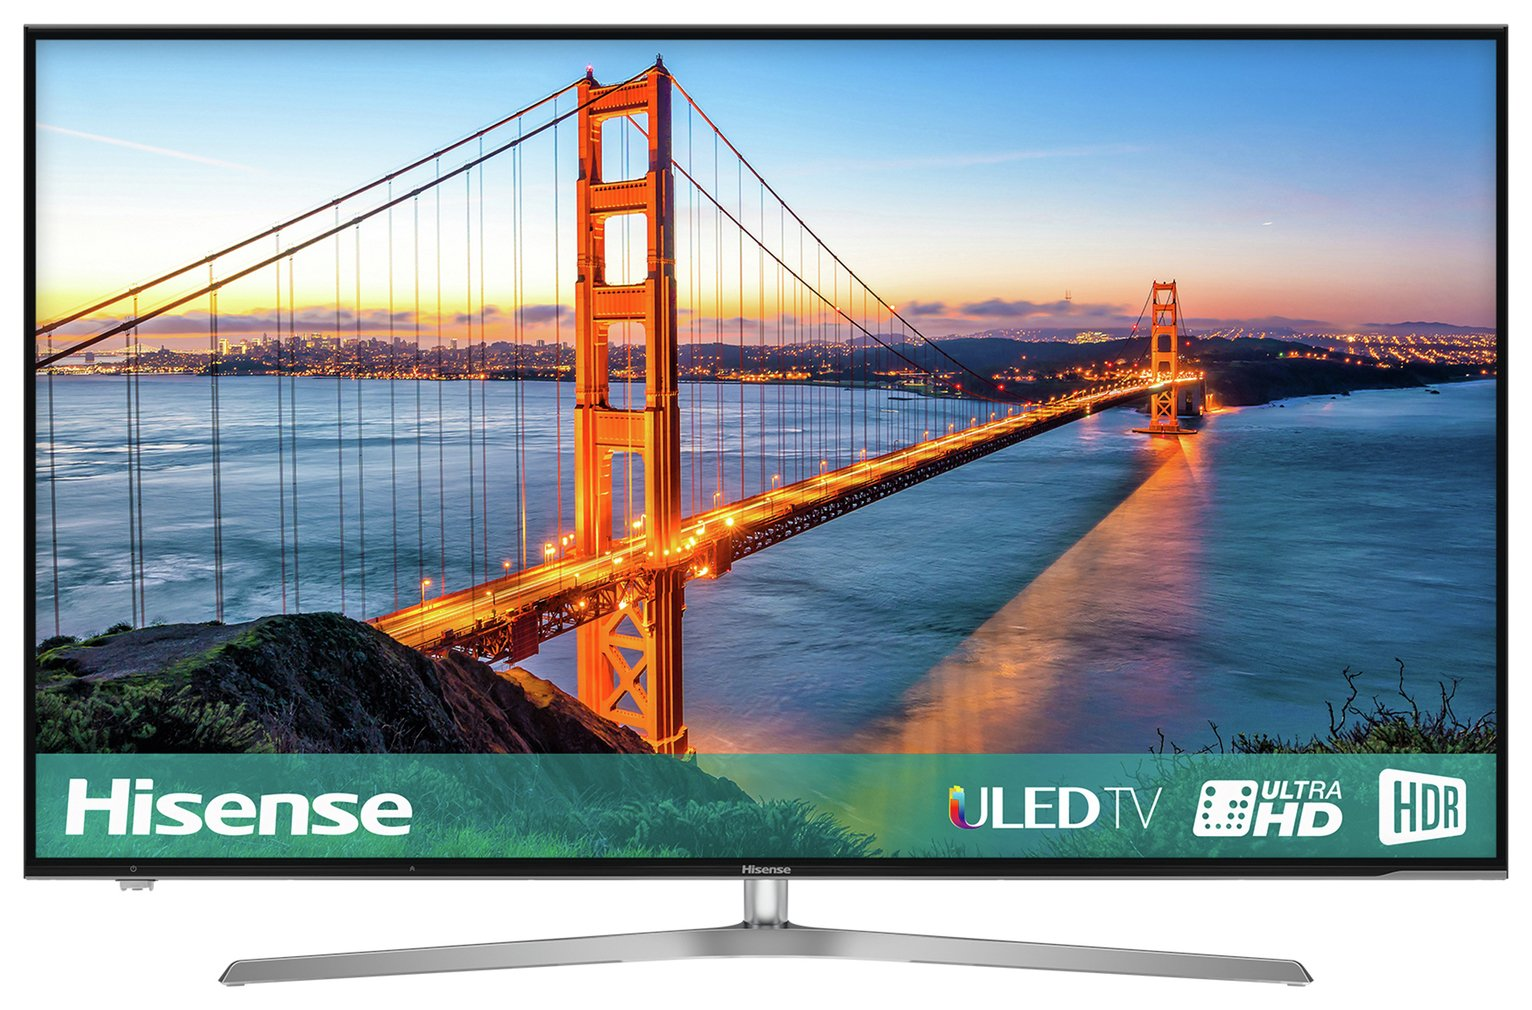 Hisense 65 Inch 65U7AUK Smart 4K UHD TV with HDR